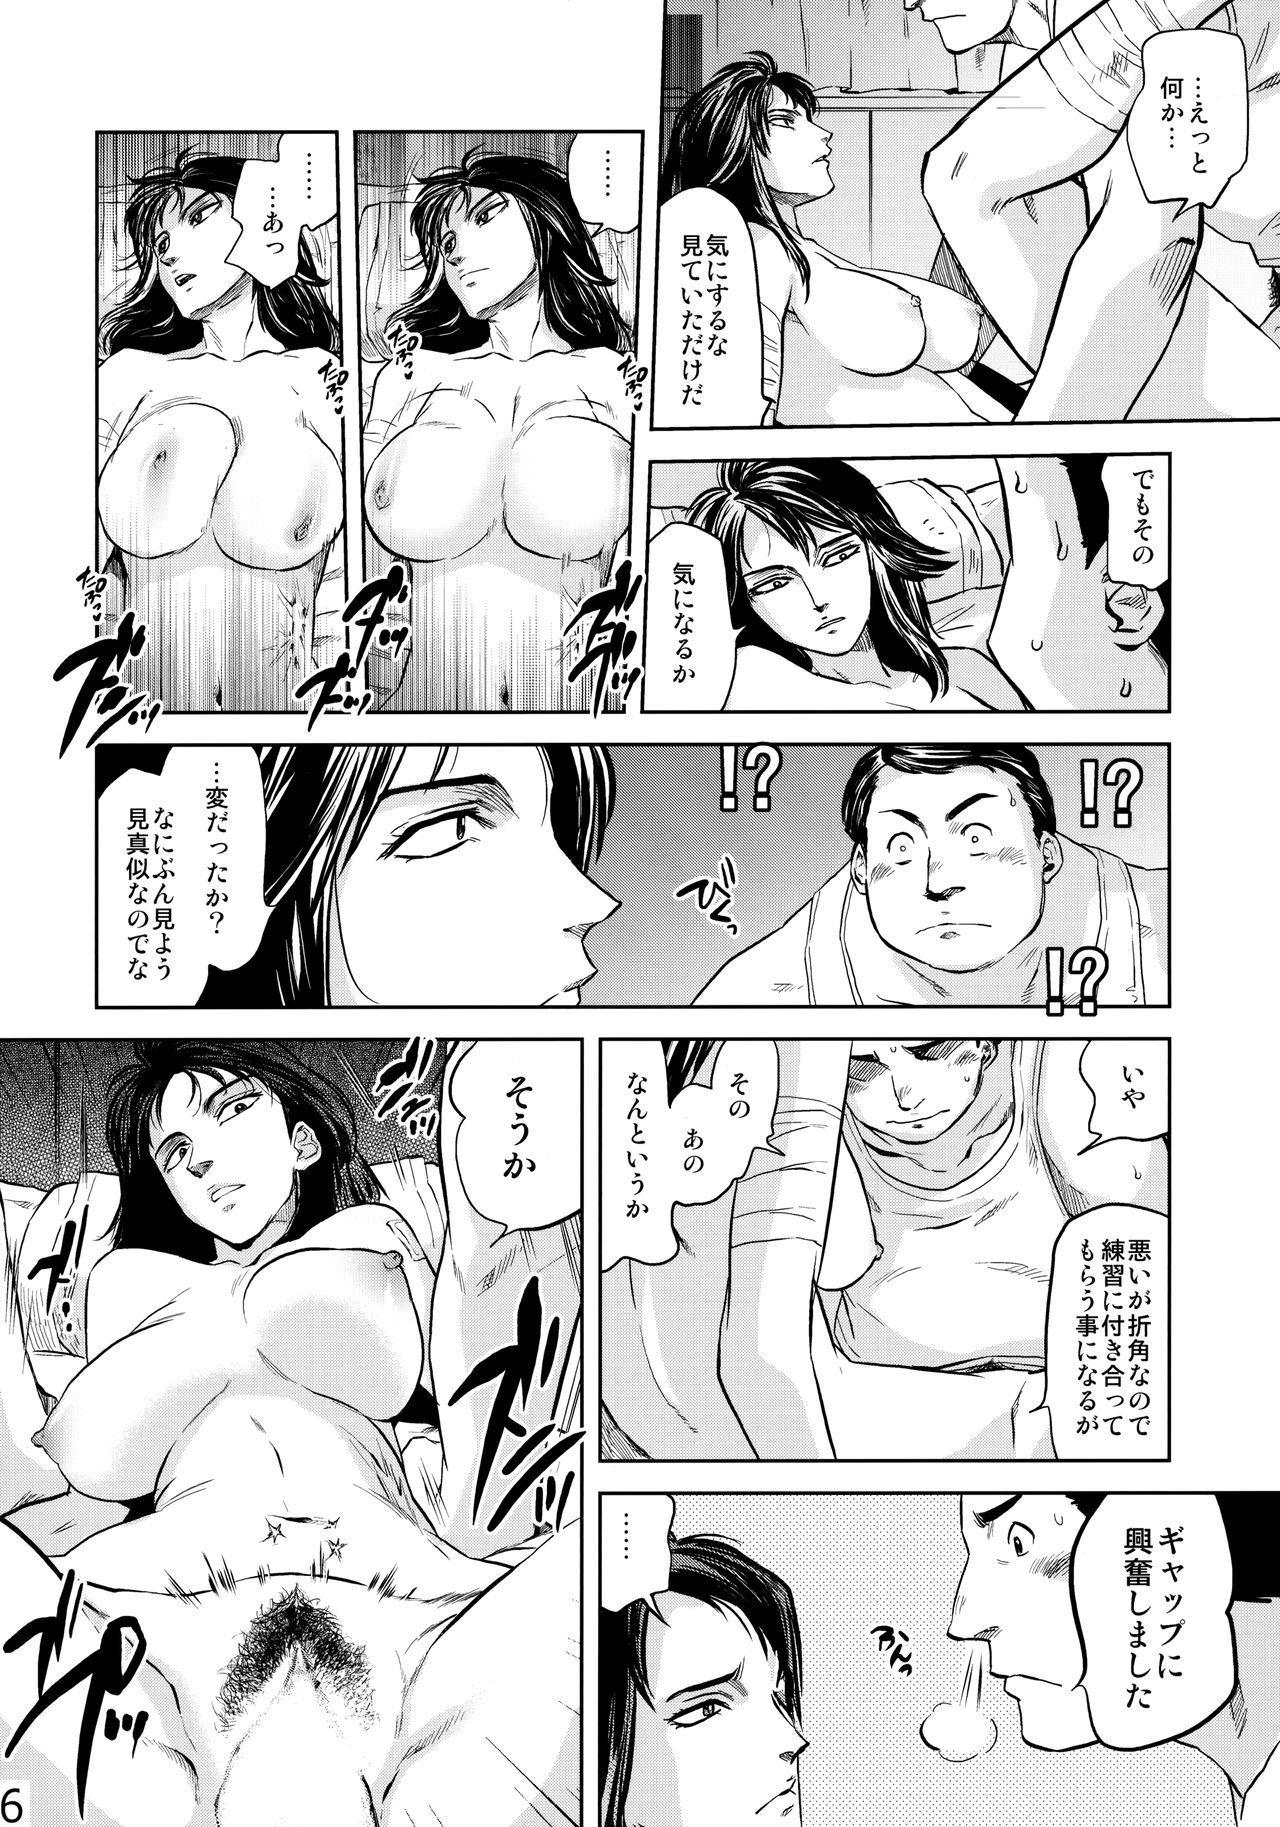 Yomeiri 44